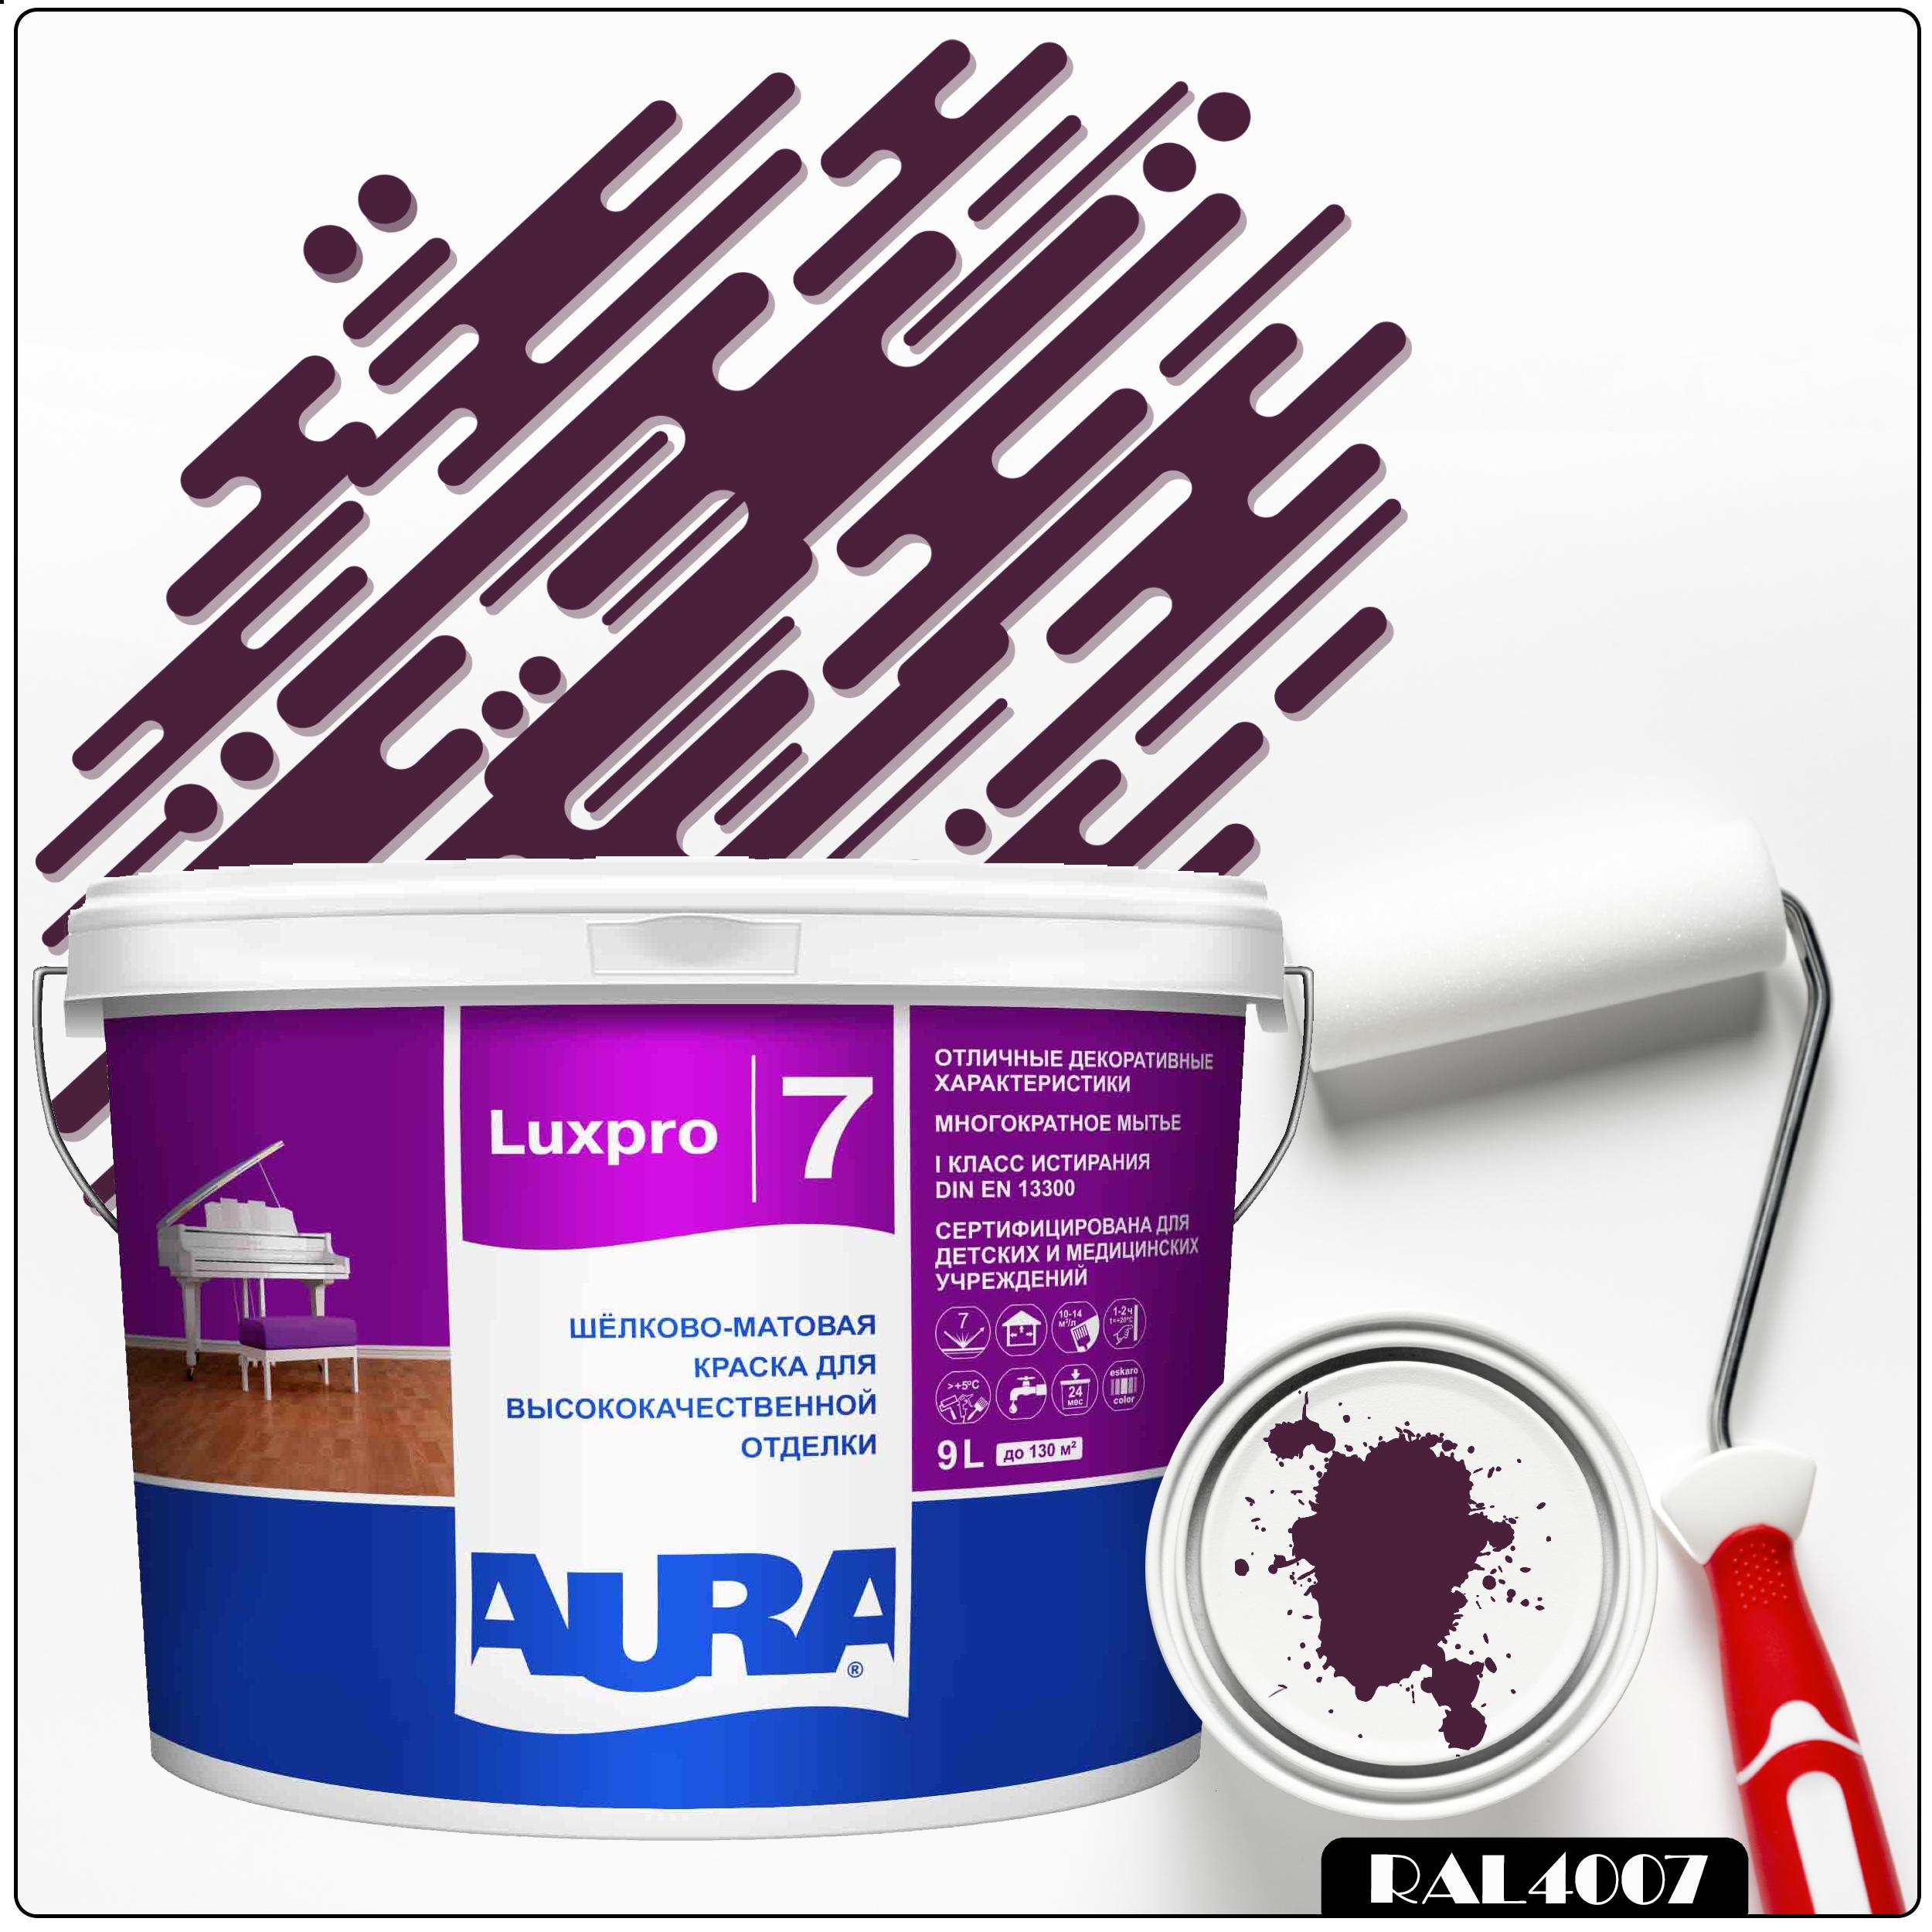 Фото 7 - Краска Aura LuxPRO 7, RAL 4007 Пурпурно-фиолетовый, латексная, шелково-матовая, интерьерная, 9л, Аура.